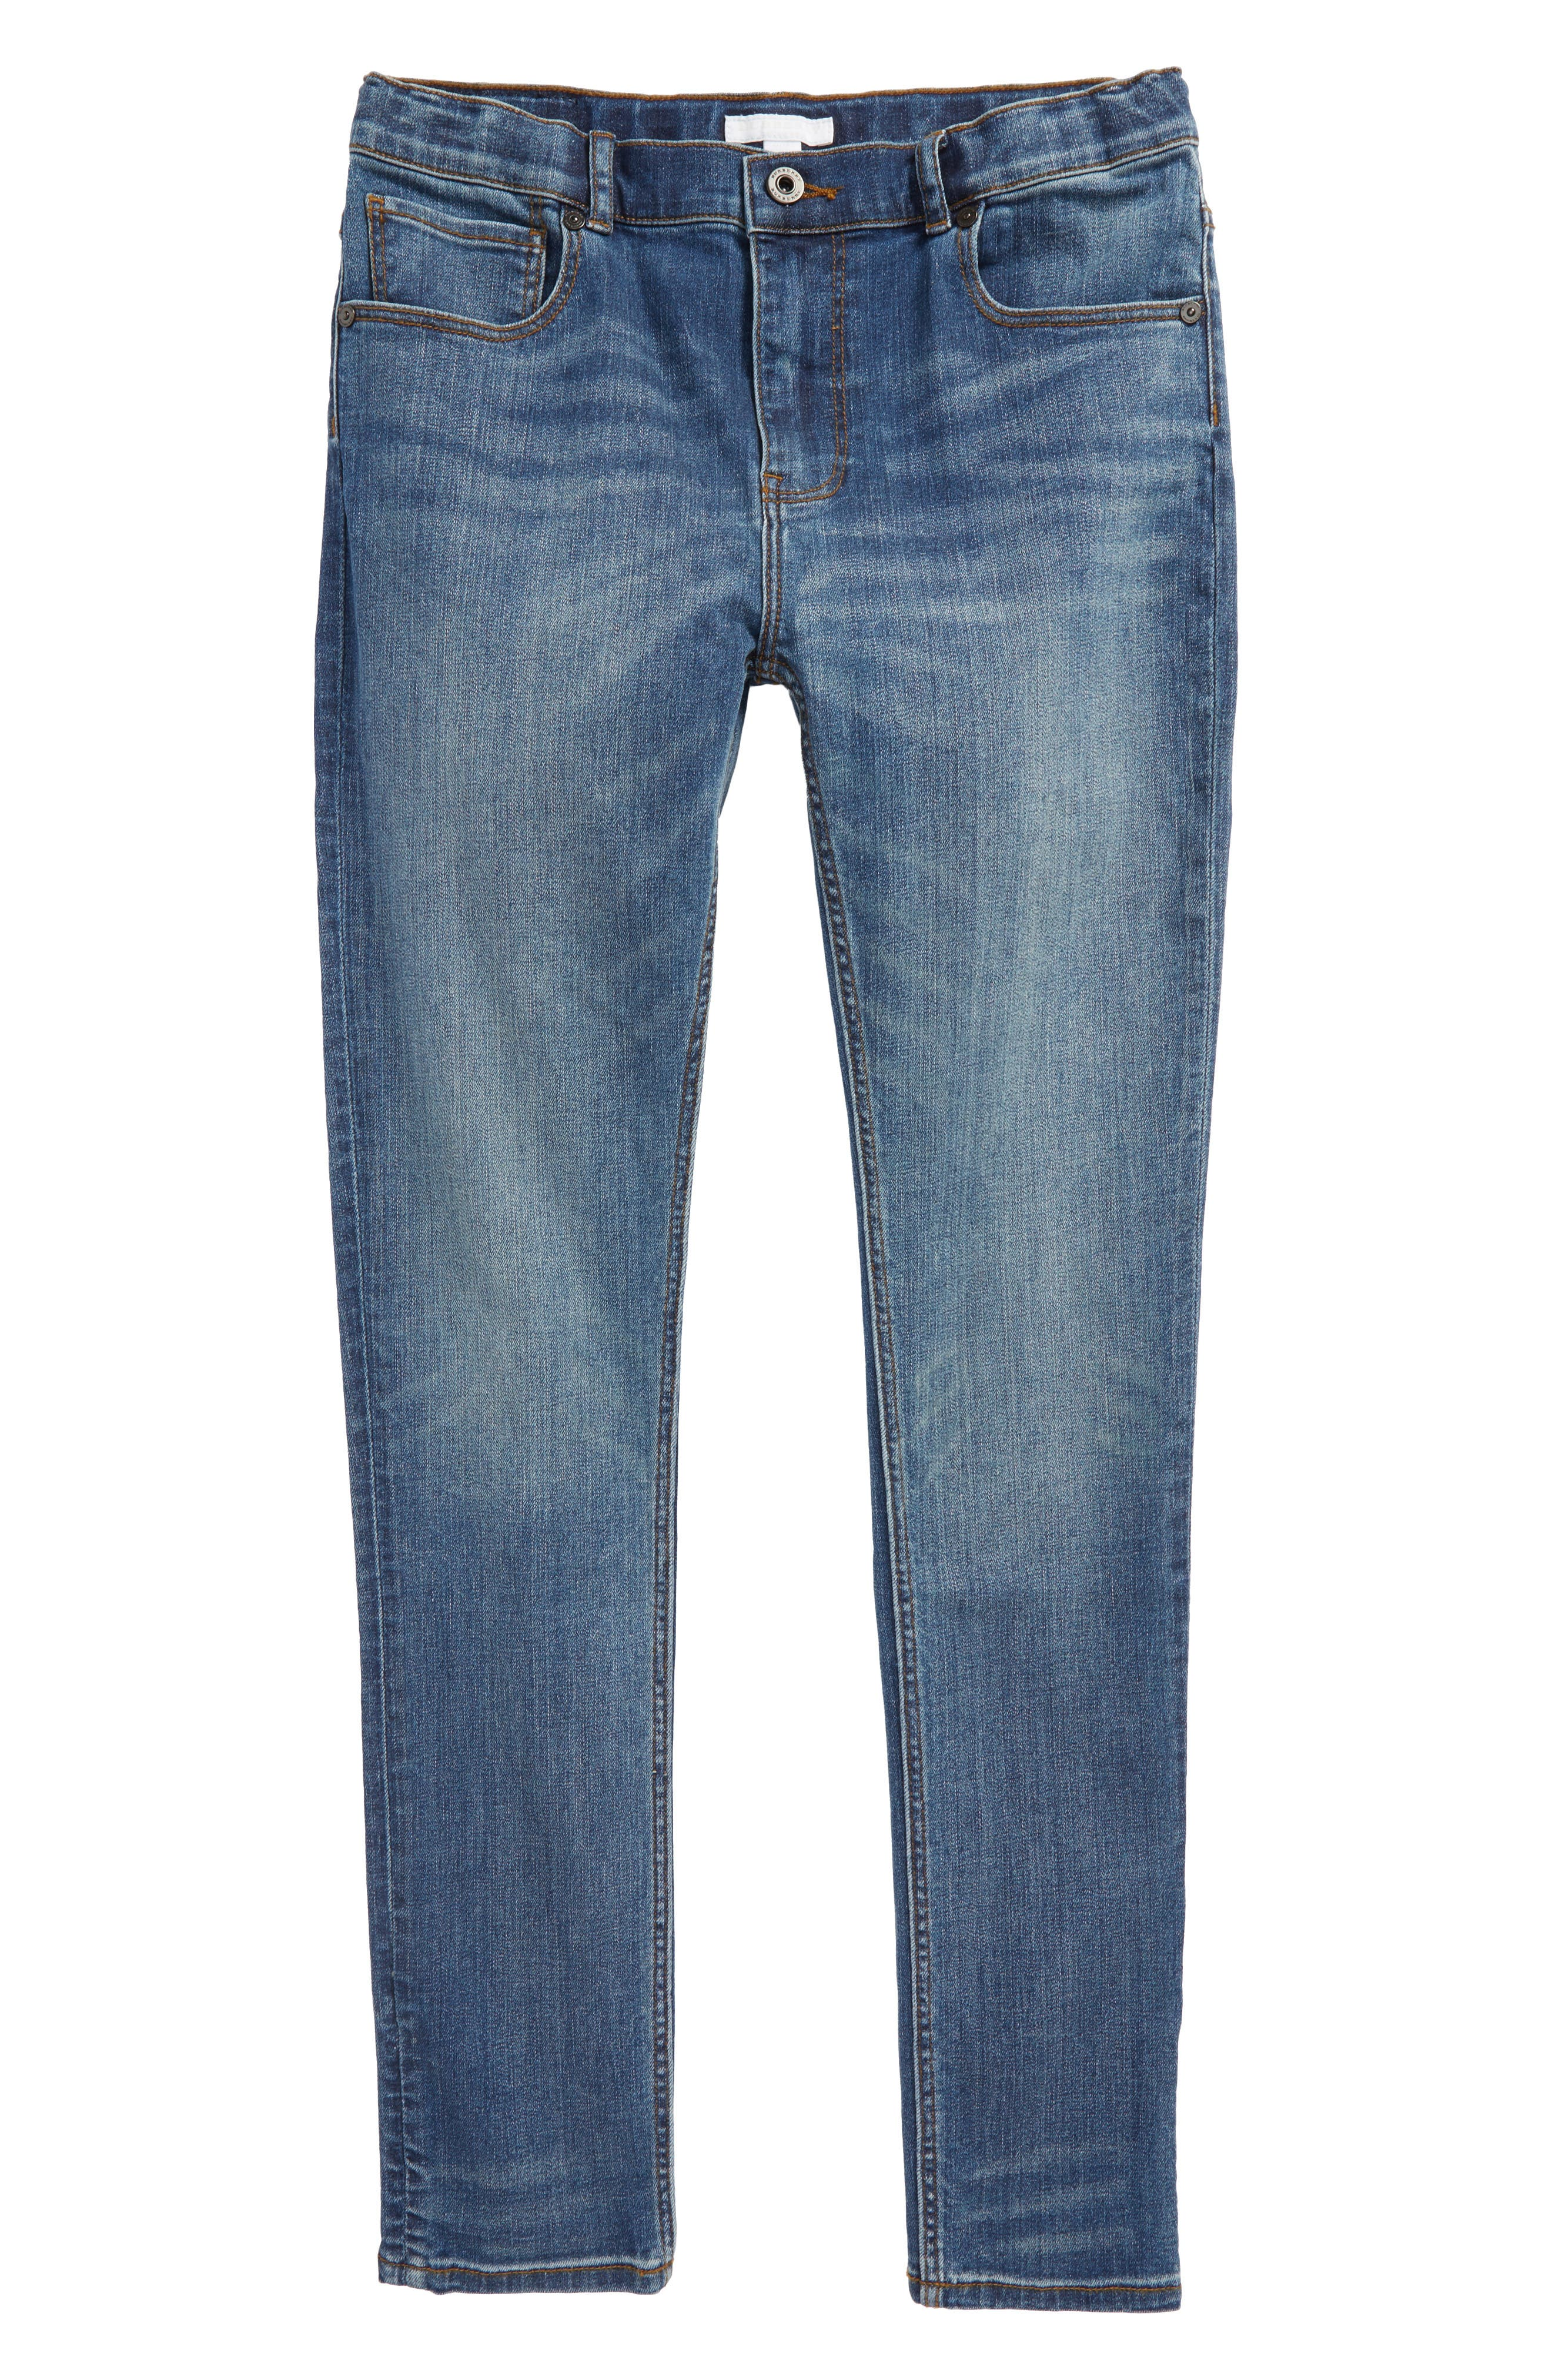 Burberry Skinny Jeans (Little Boys & Big Boys)